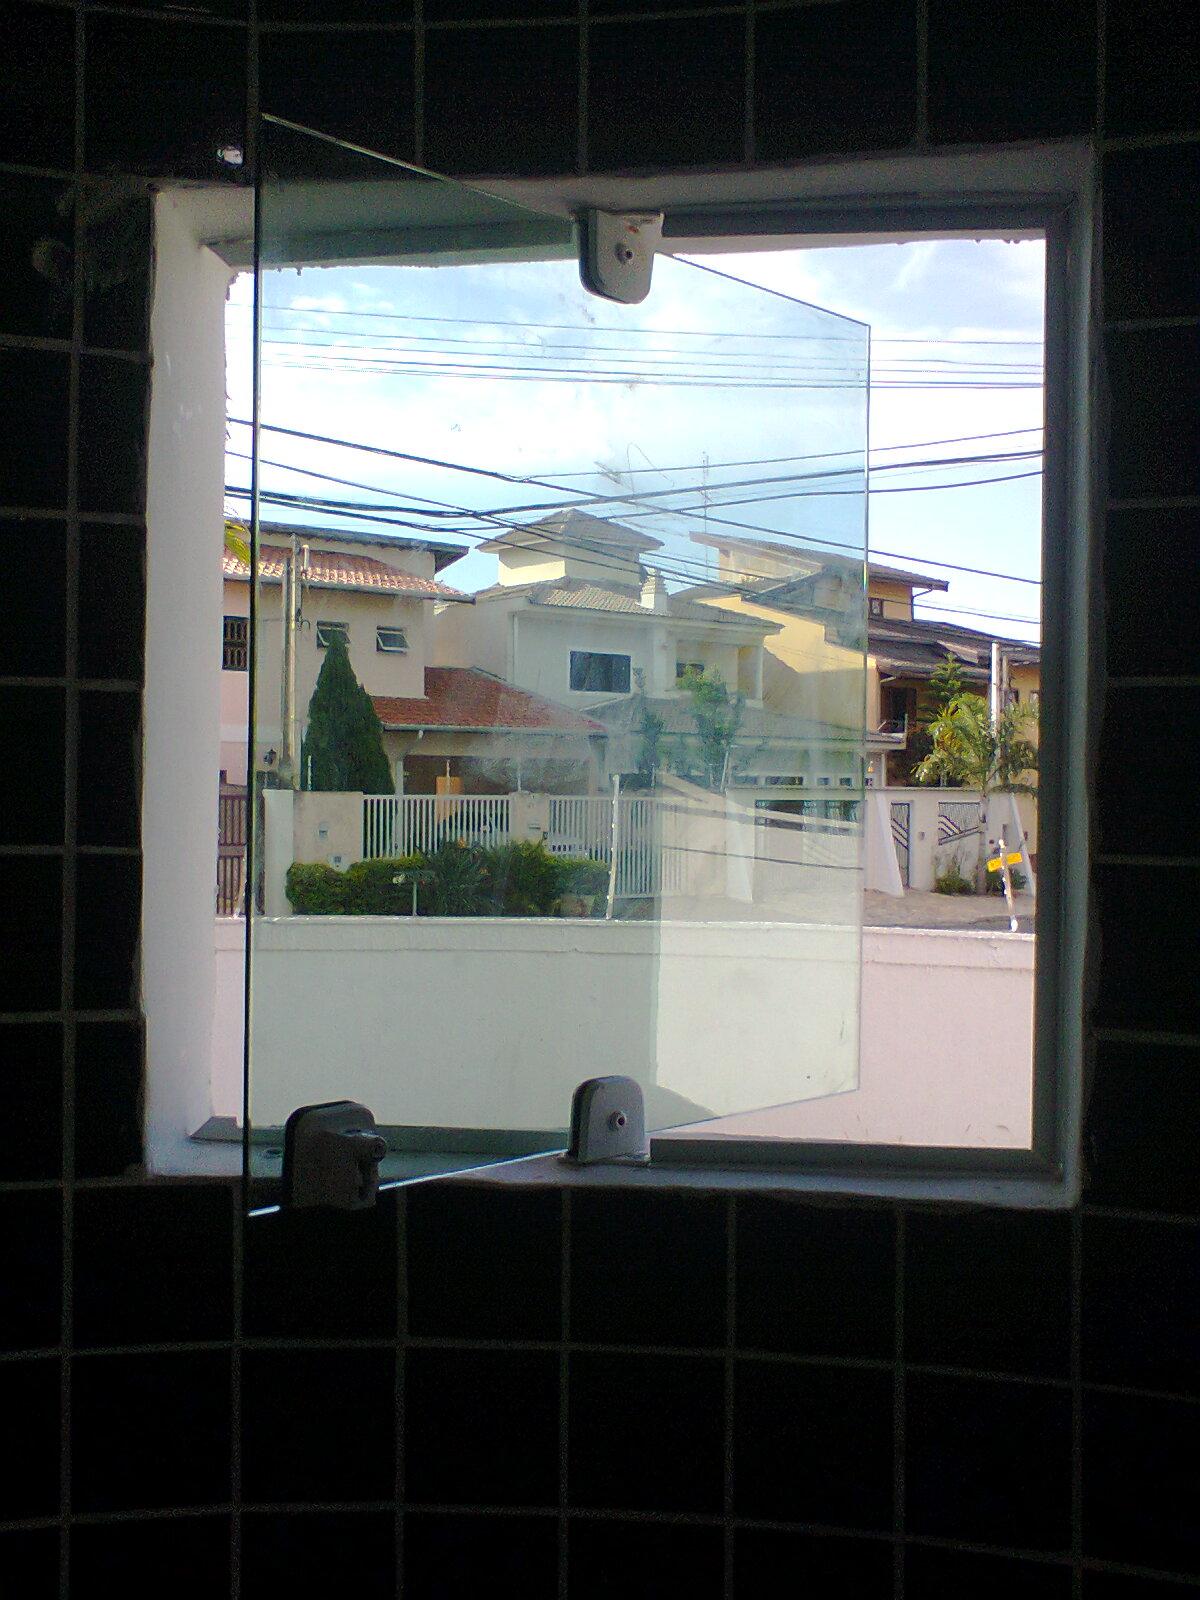 #436A88 Janelas De Vidro Para Banheiro 2 Pictures to pin on Pinterest 176 Janelas De Vidro Mercadolivre